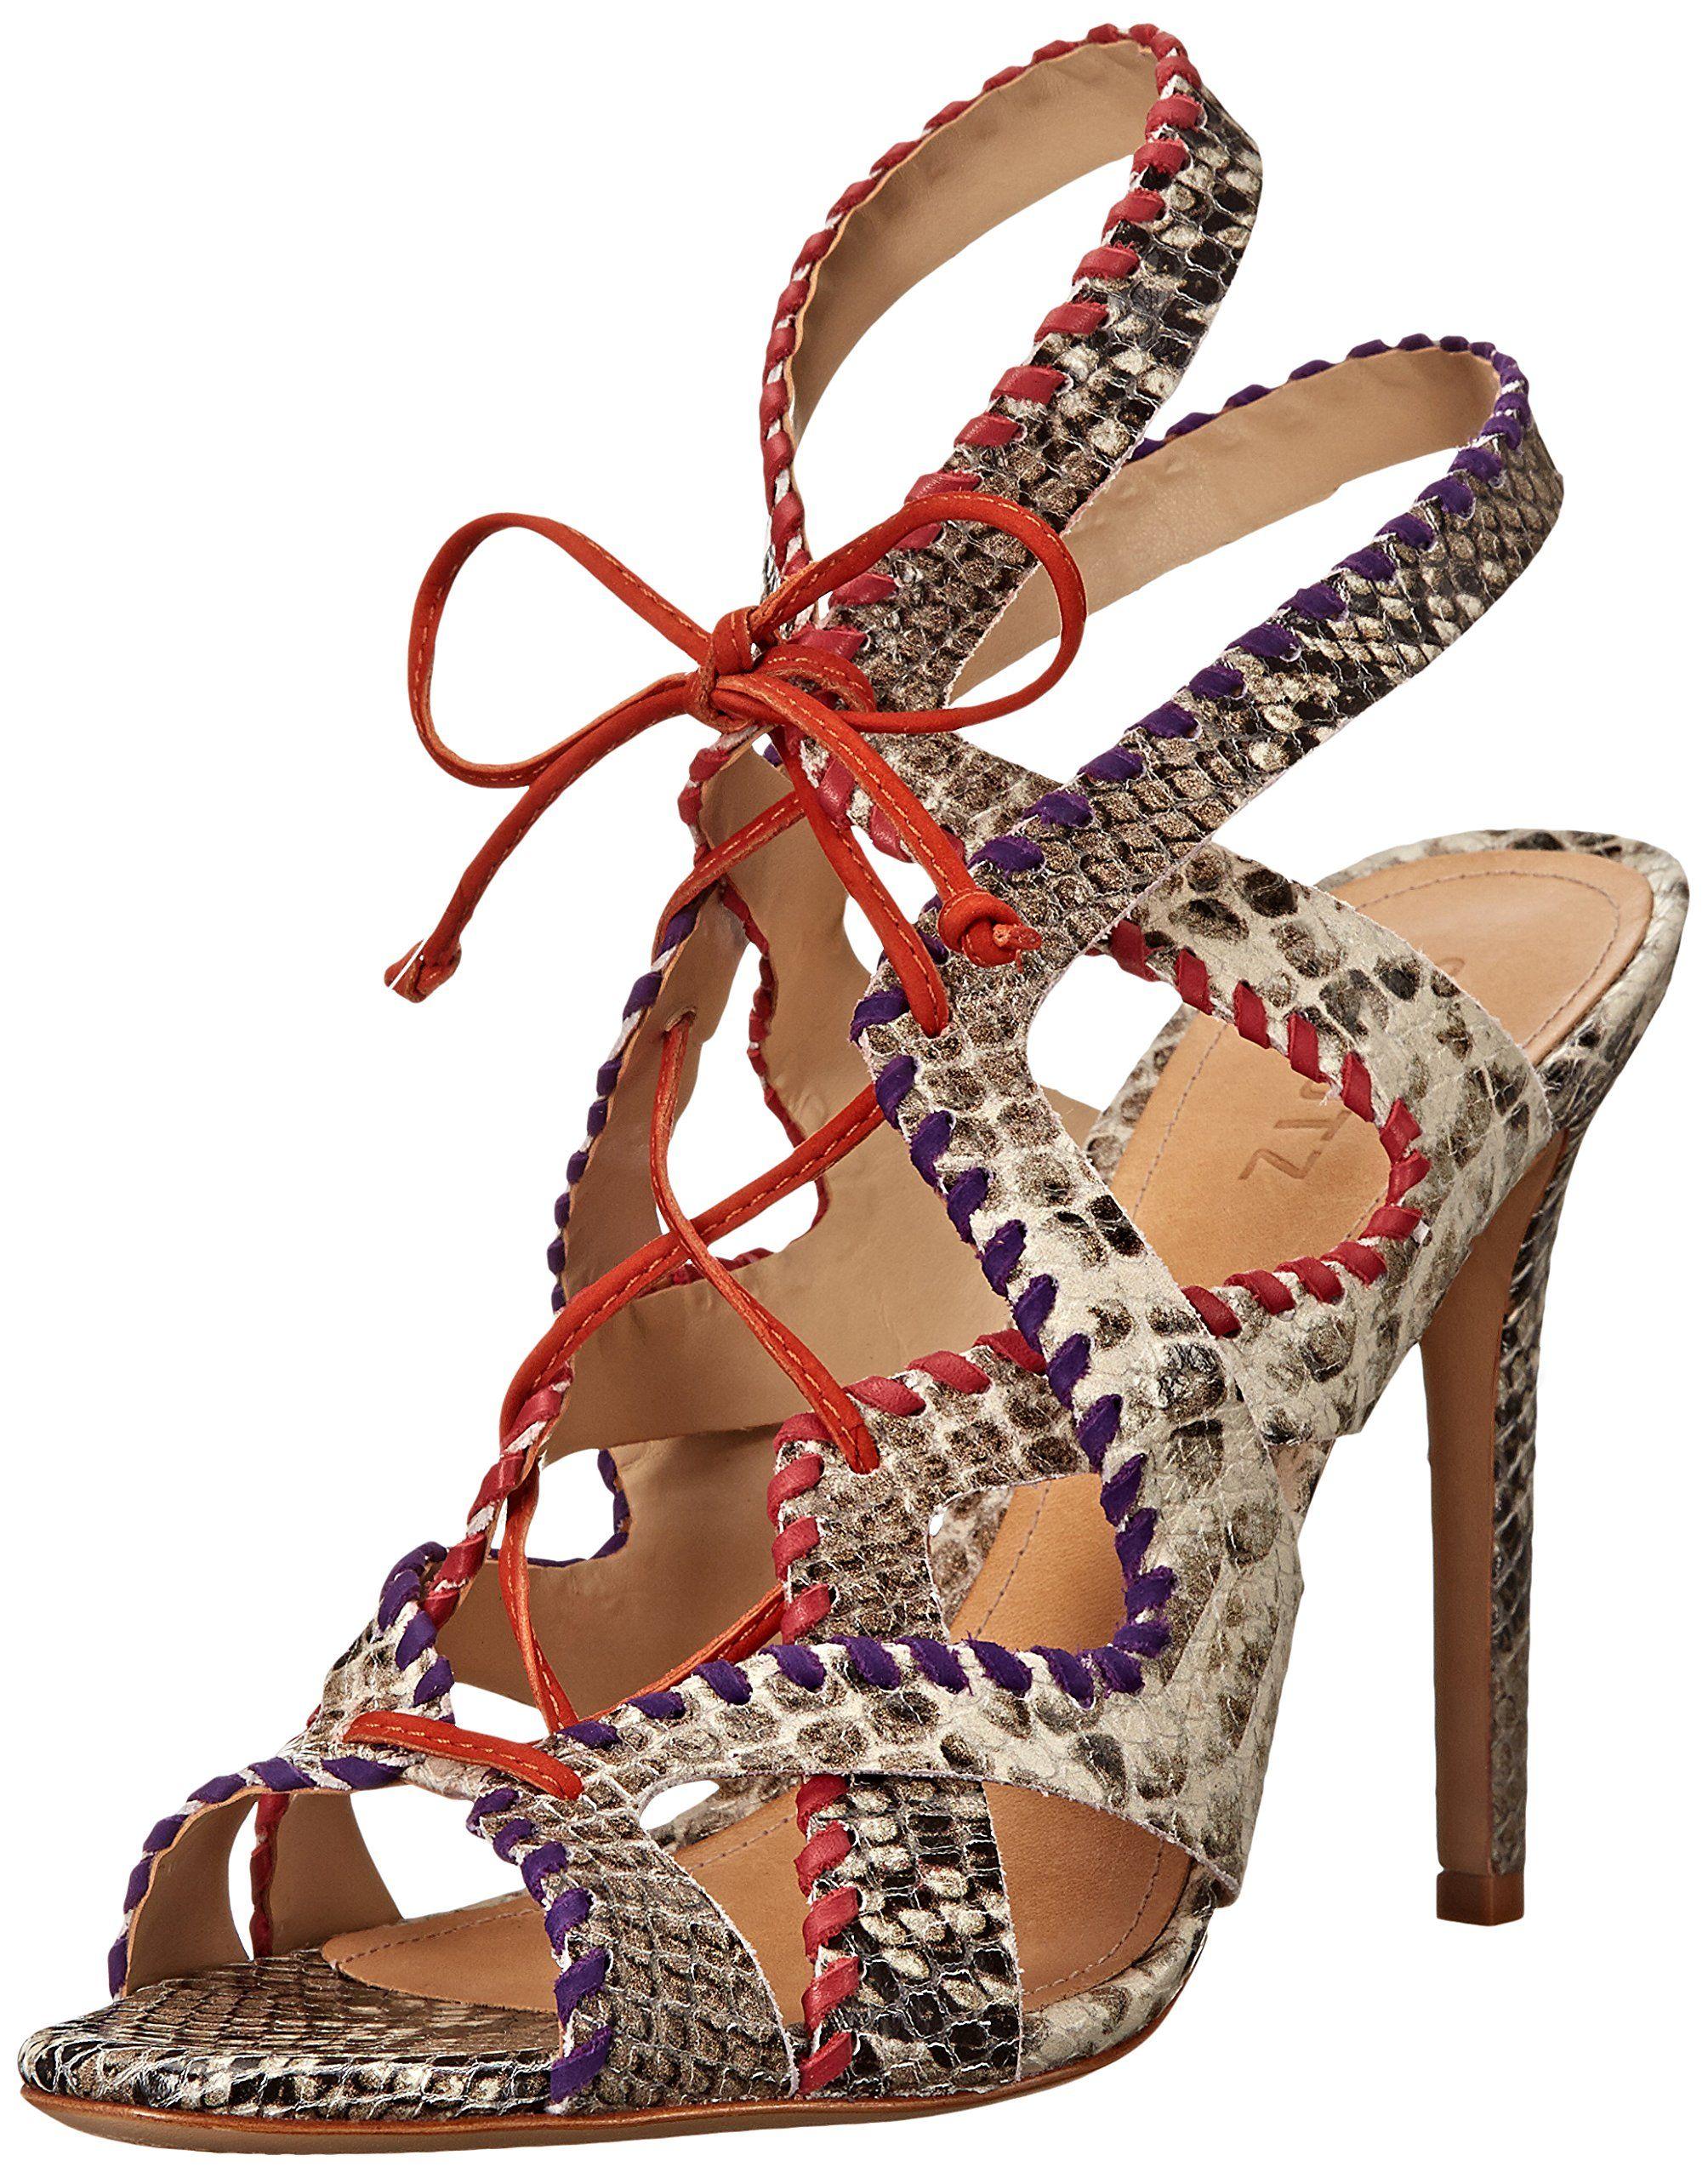 Schutz Women's Lenna Dress Sandal, Pearl/Violet/Red/Nectarina, 8.5 M